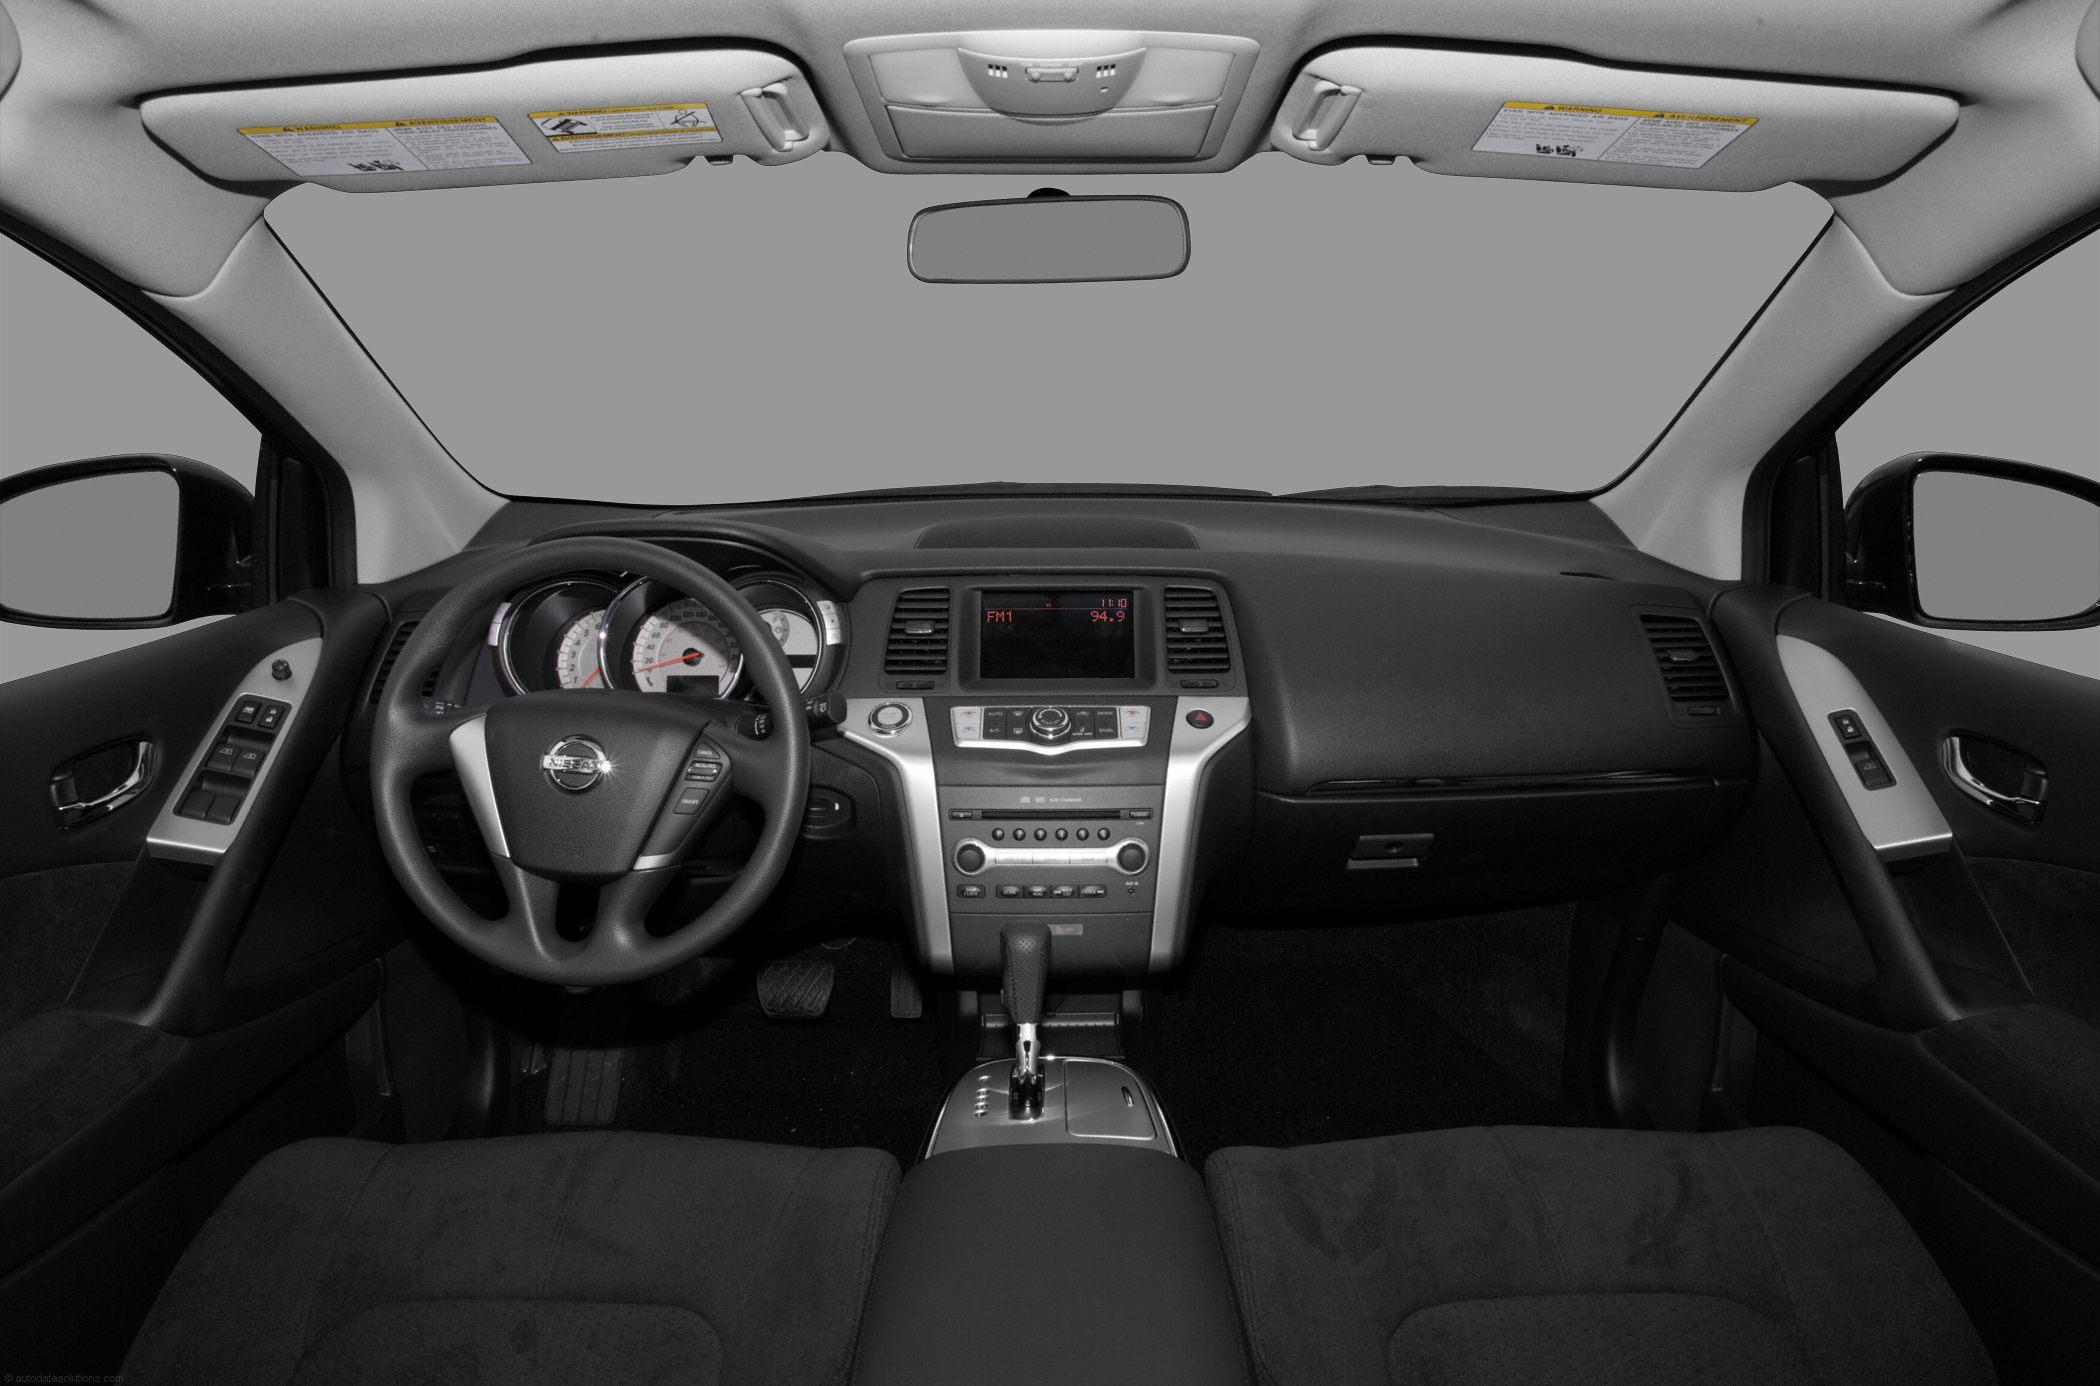 Nissan rogue interior 2010 image gallery hcpr interior 2010 nissan murano 17 nissan murano 17 vanachro Choice Image